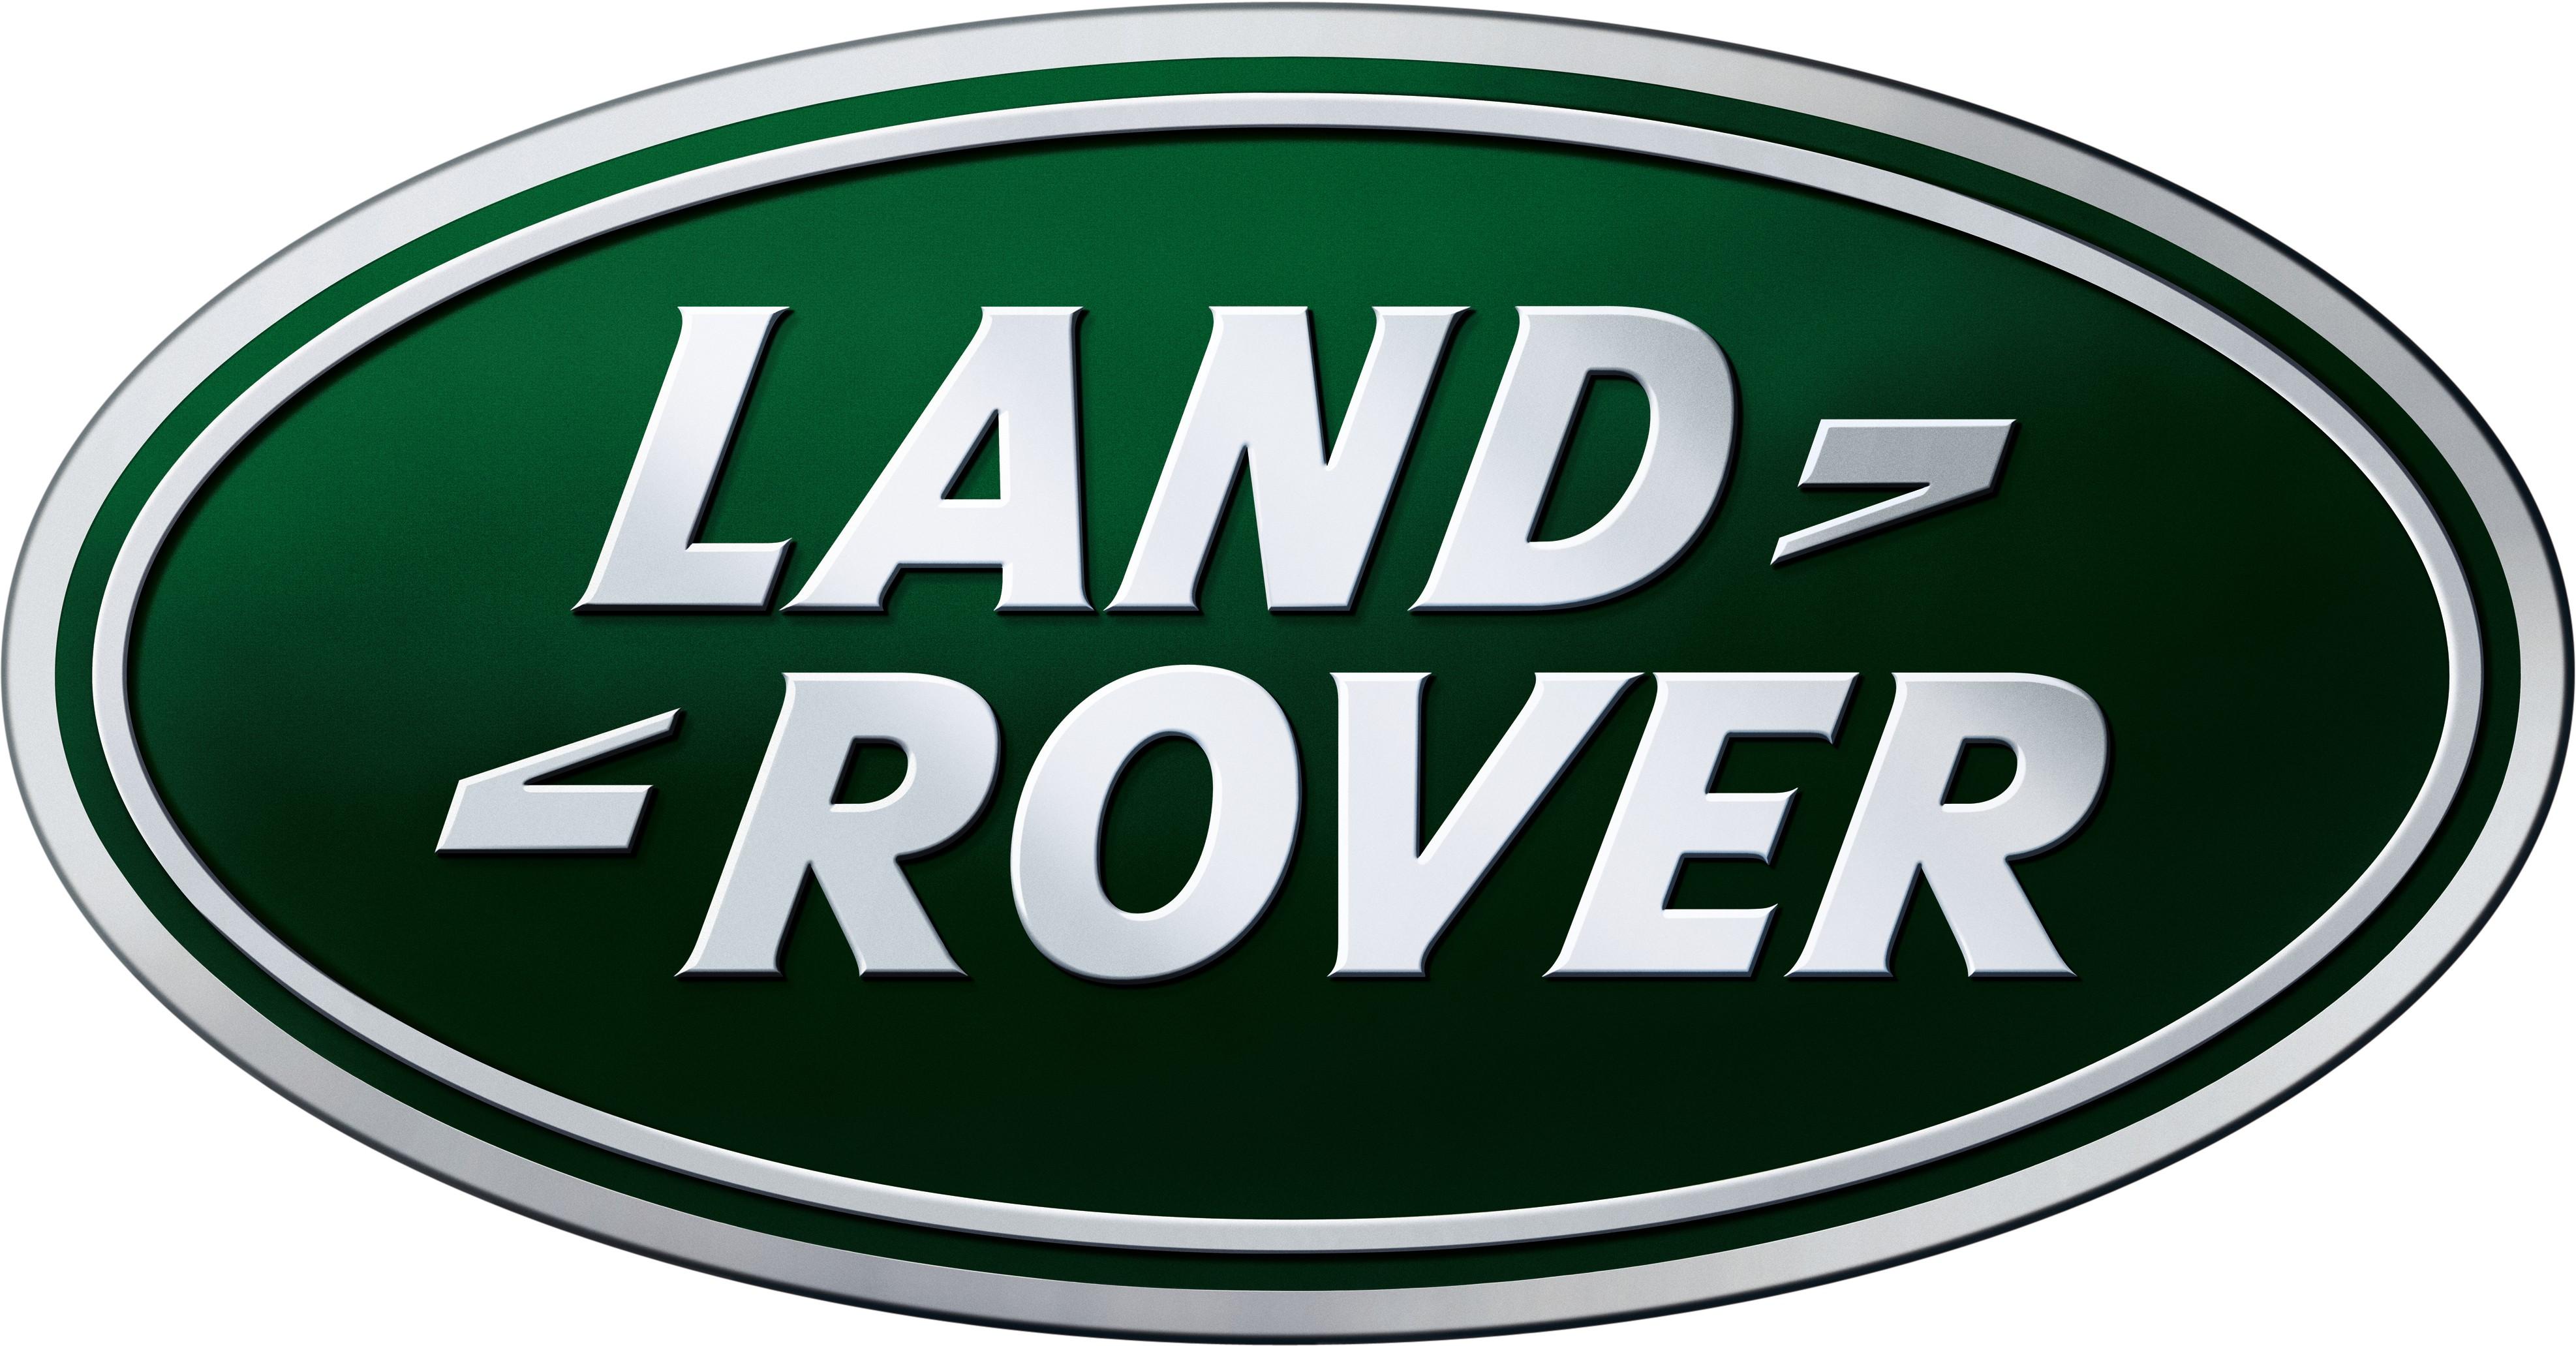 Land rover logo png wallpaper 5 1